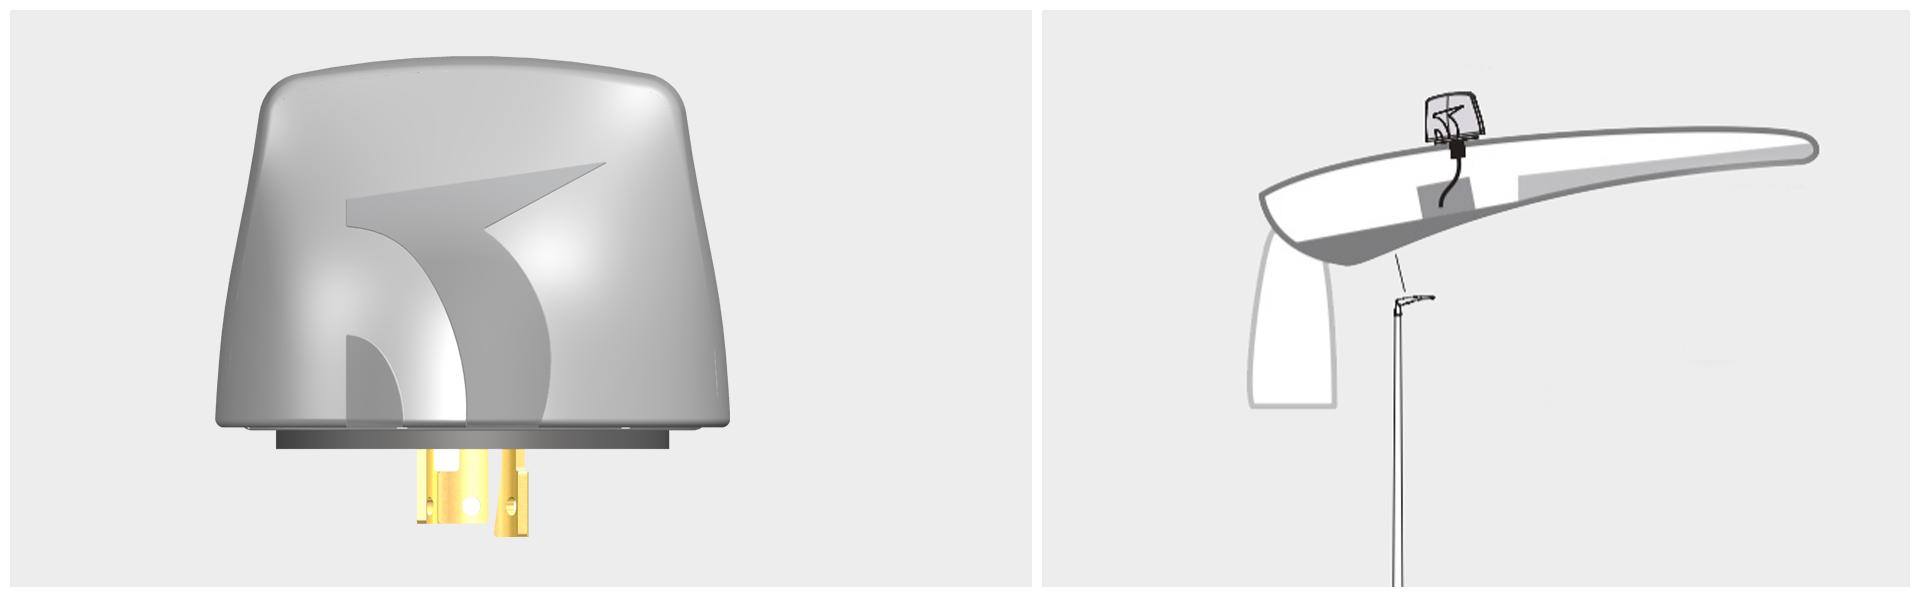 industrial design-licht sensor